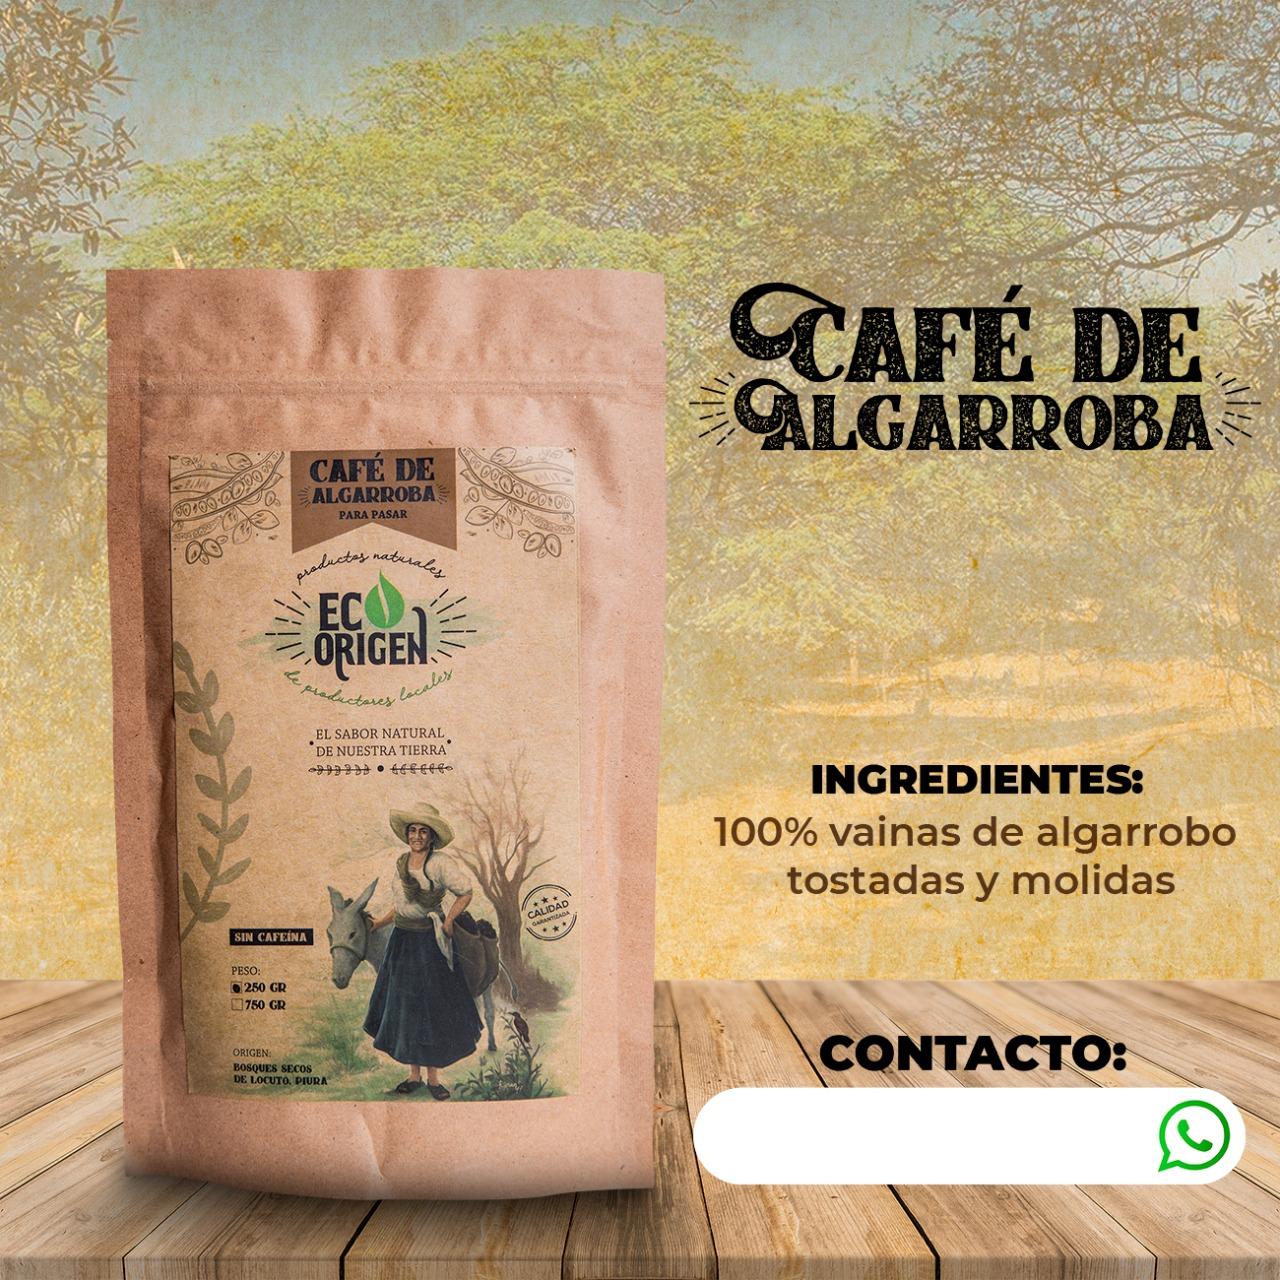 Café de algarroba Eco Origen